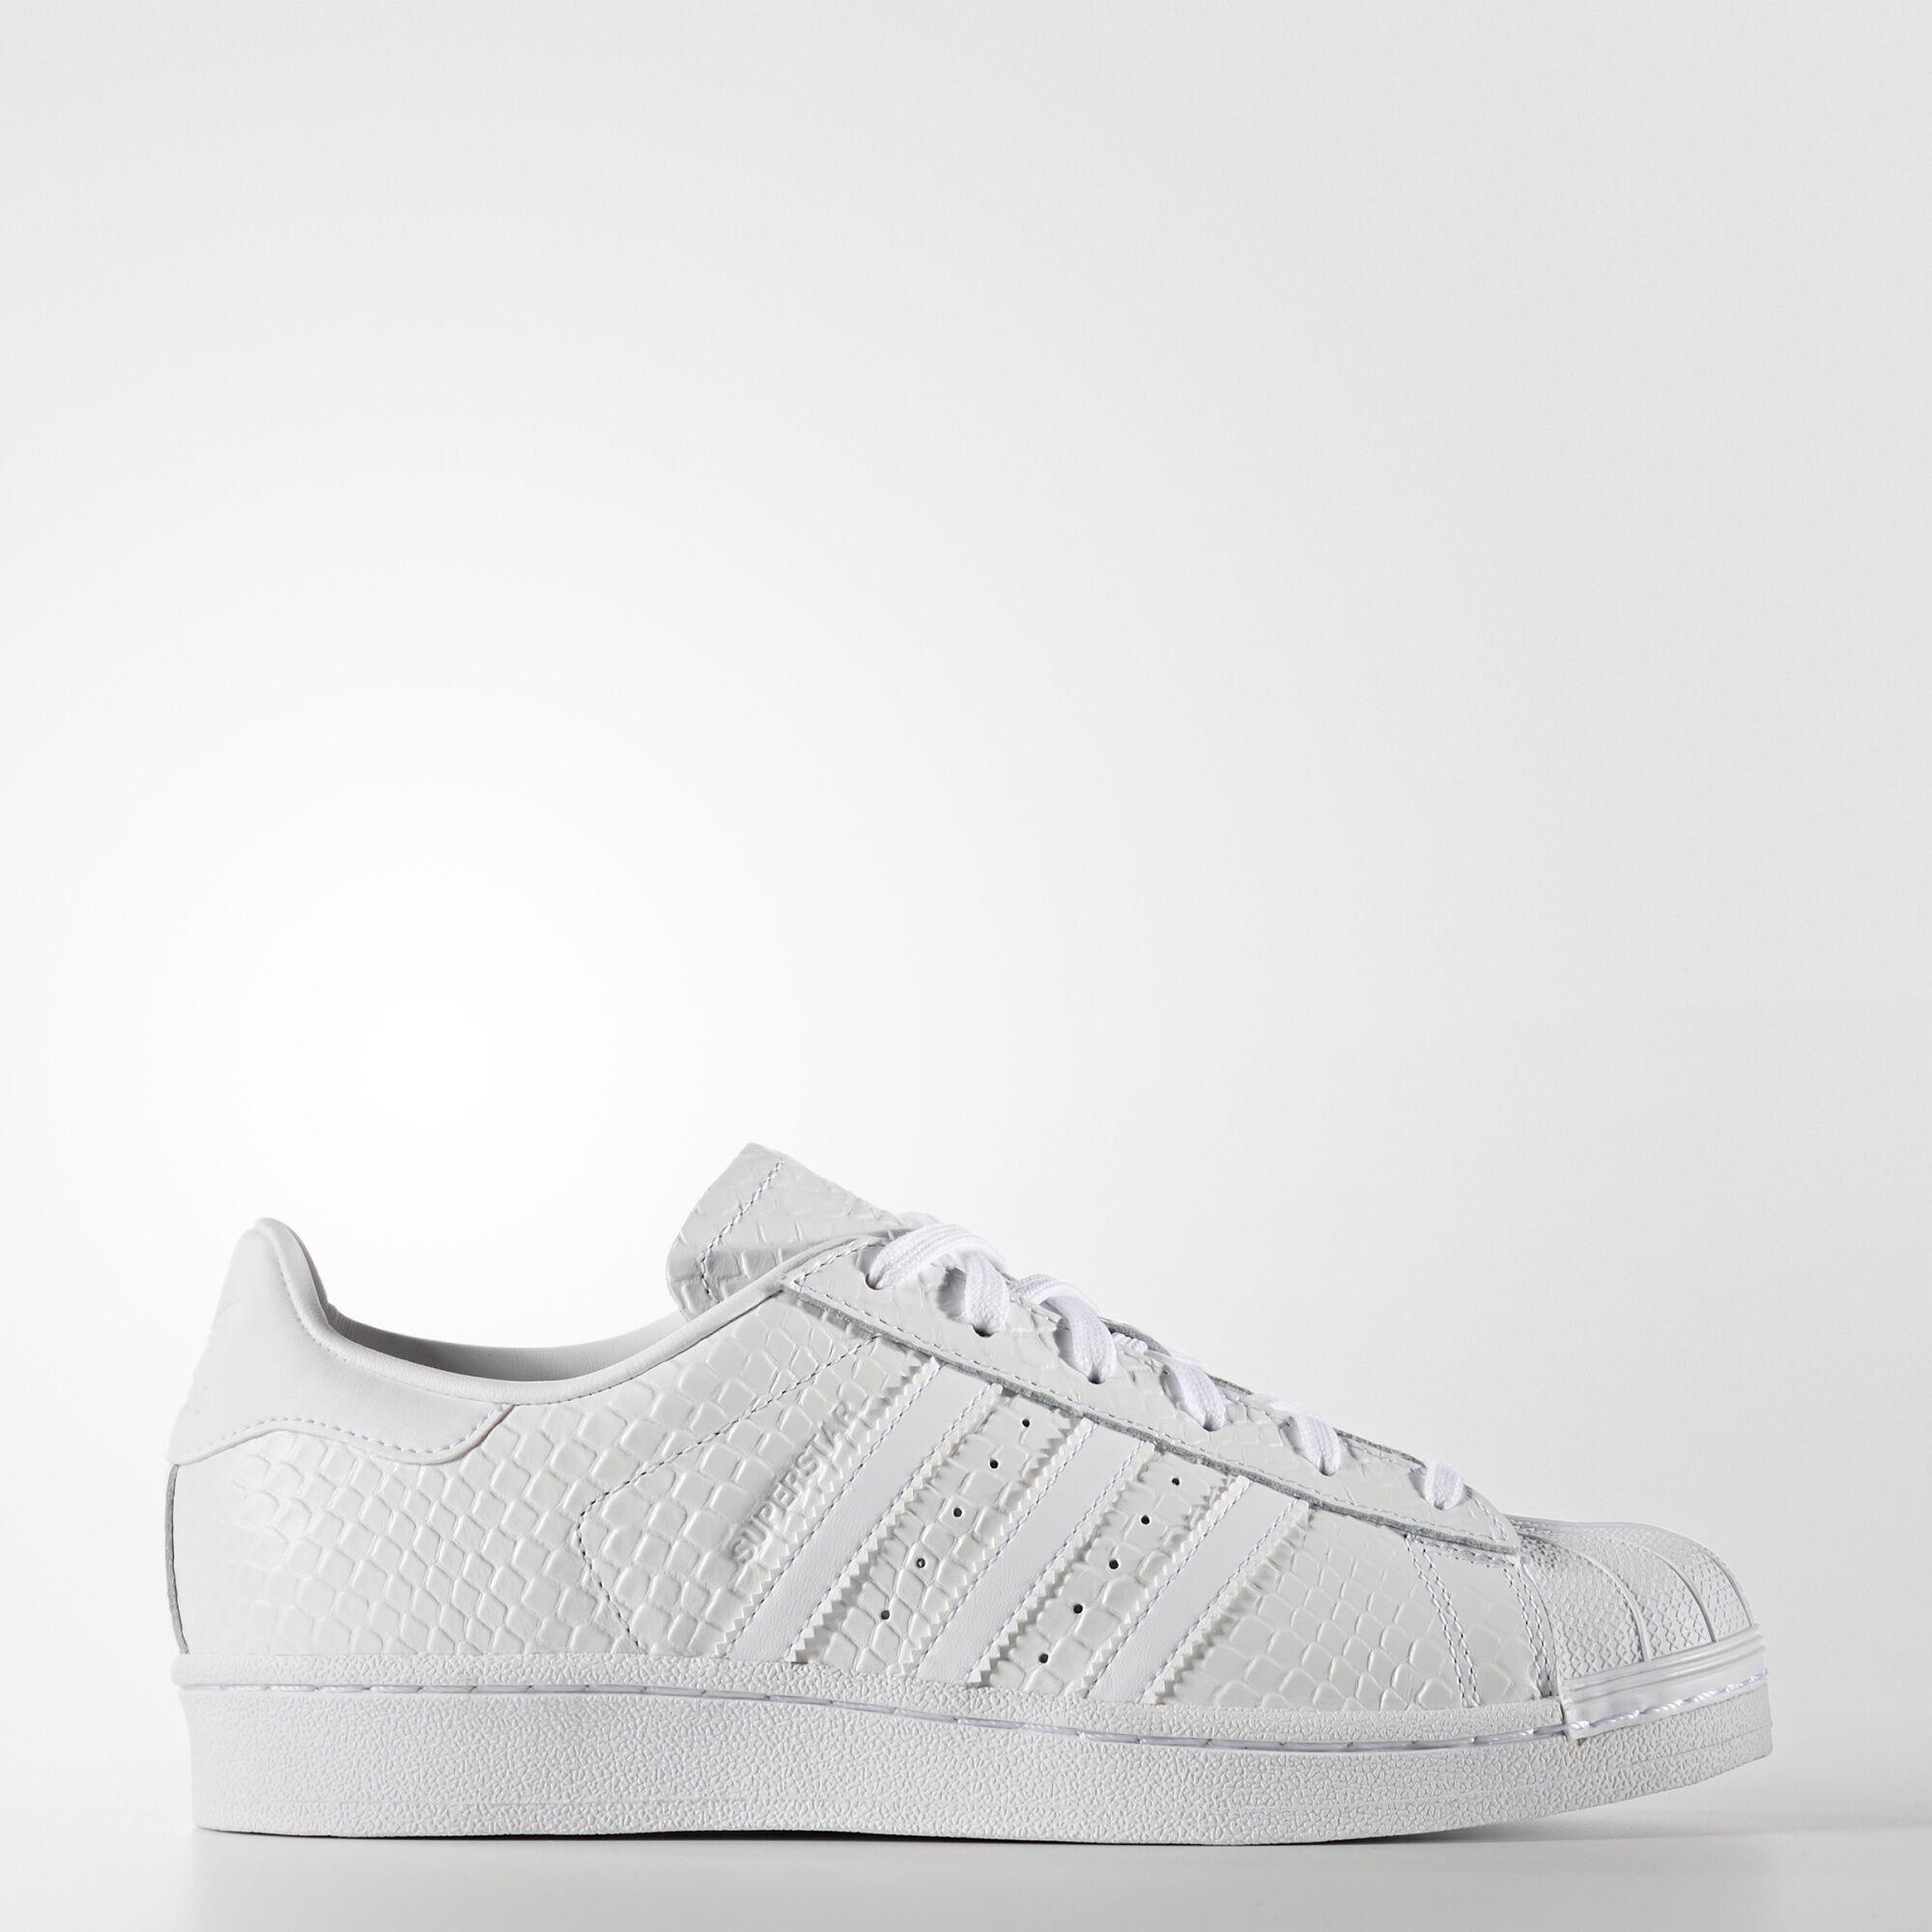 Adidas Superstar Running White